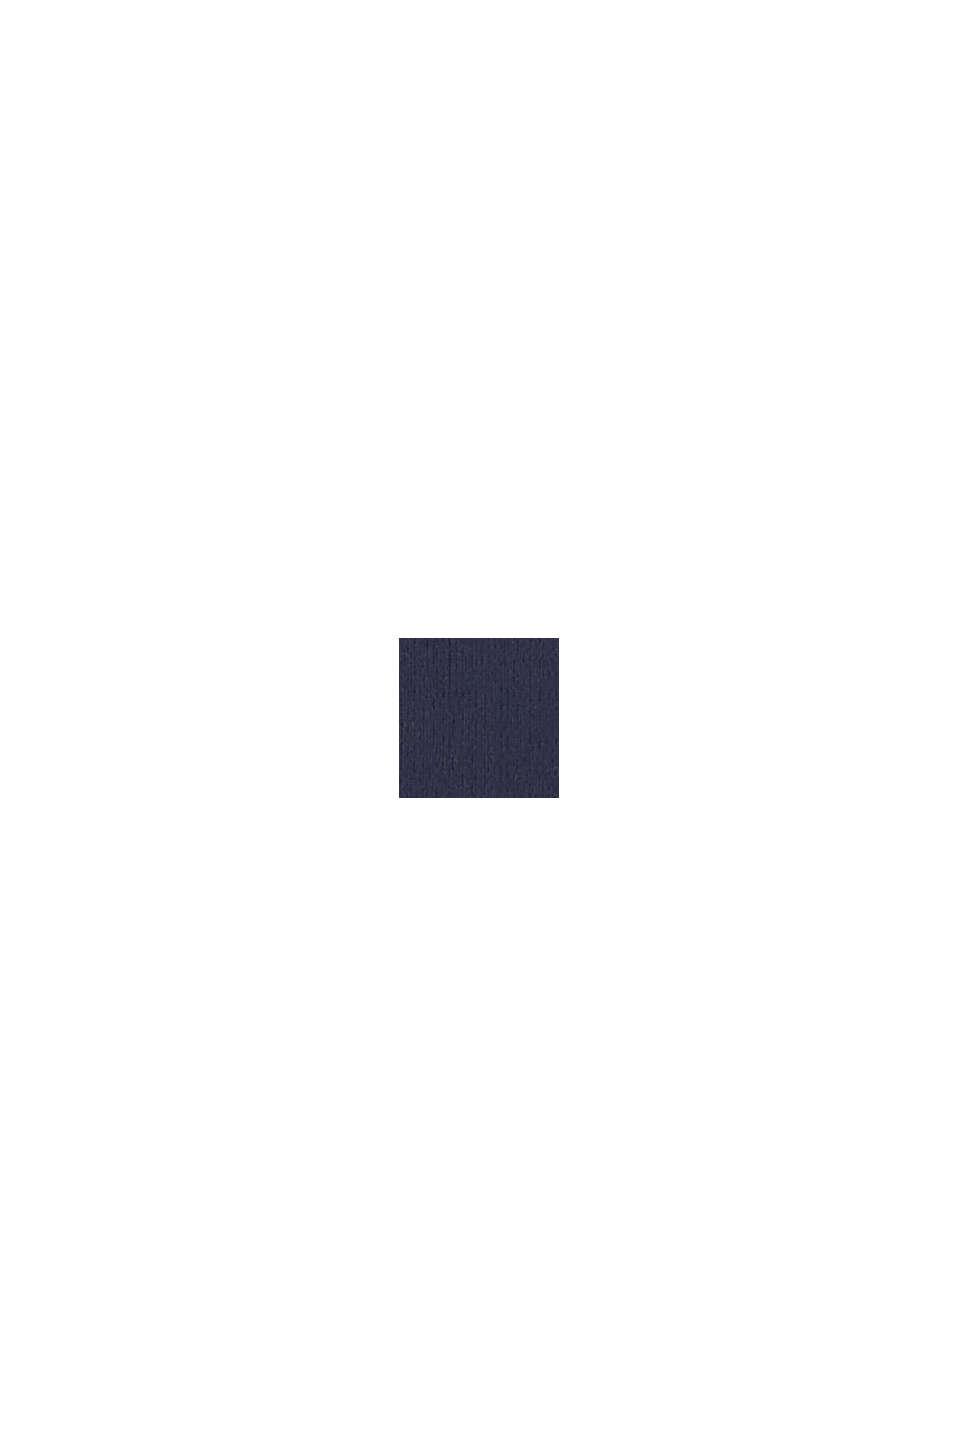 Badedragt med farveharmonisk logoprint, NAVY, swatch